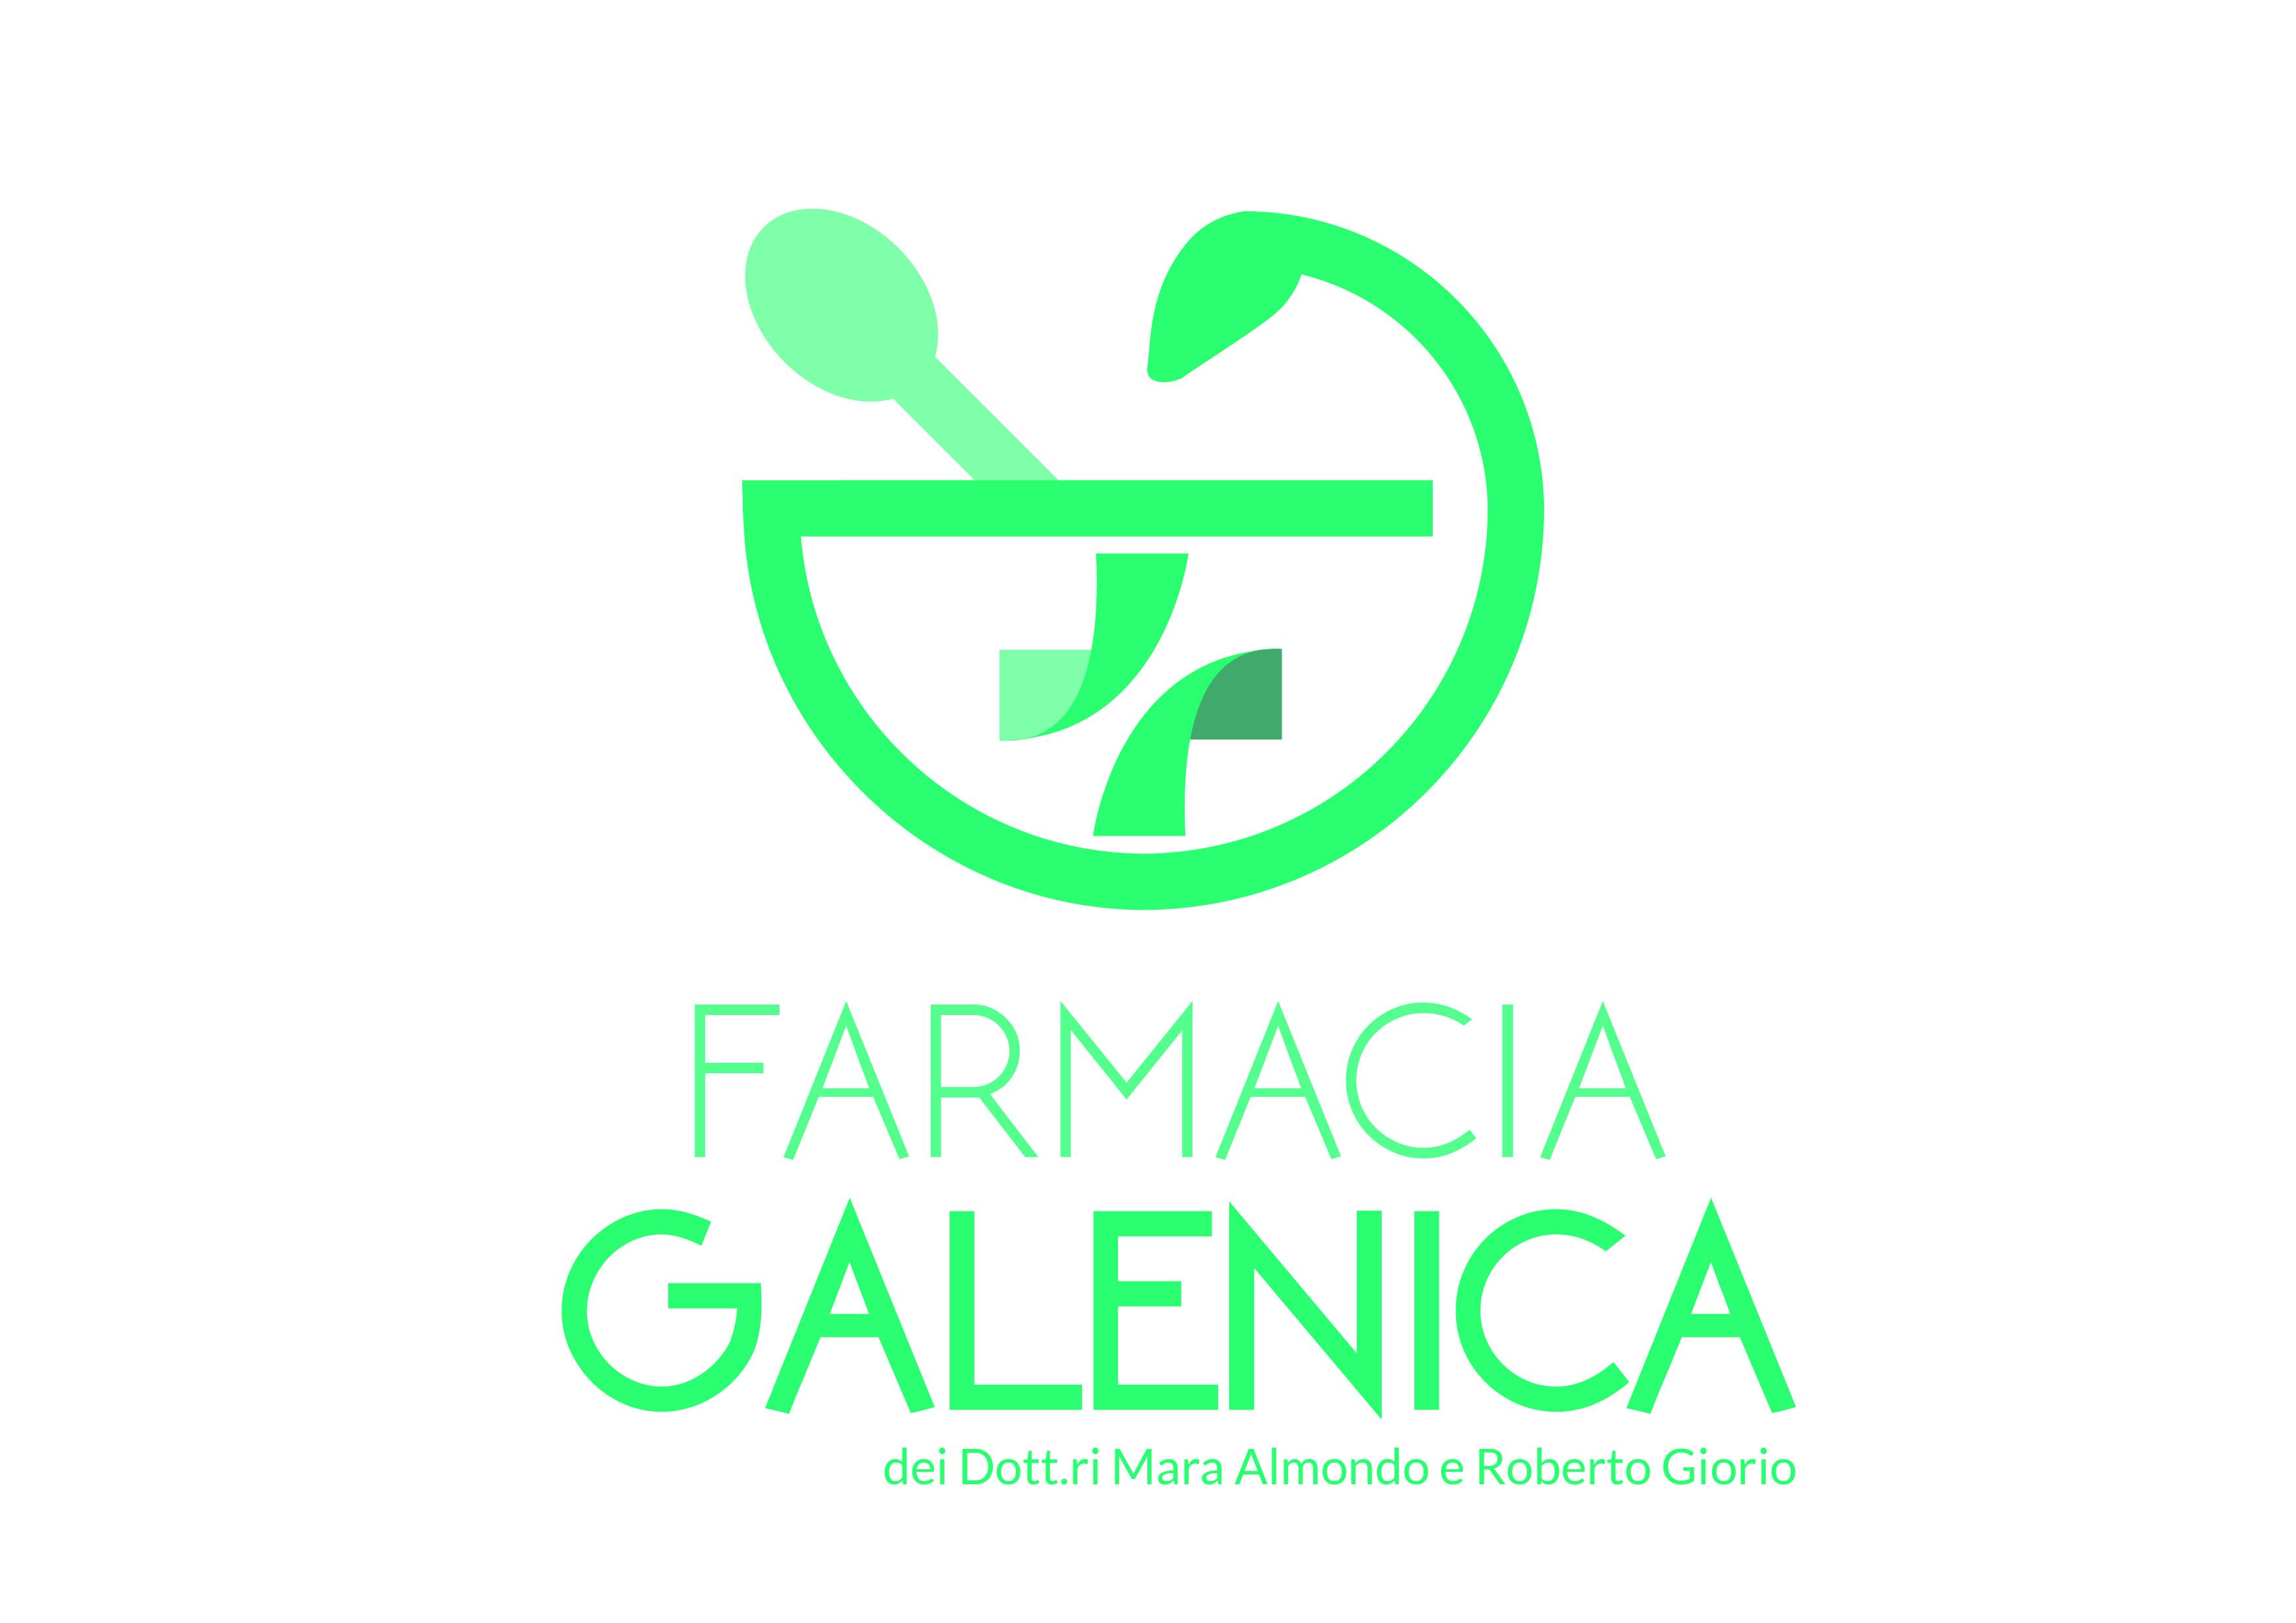 FARMACIA GALENICA - LOGO